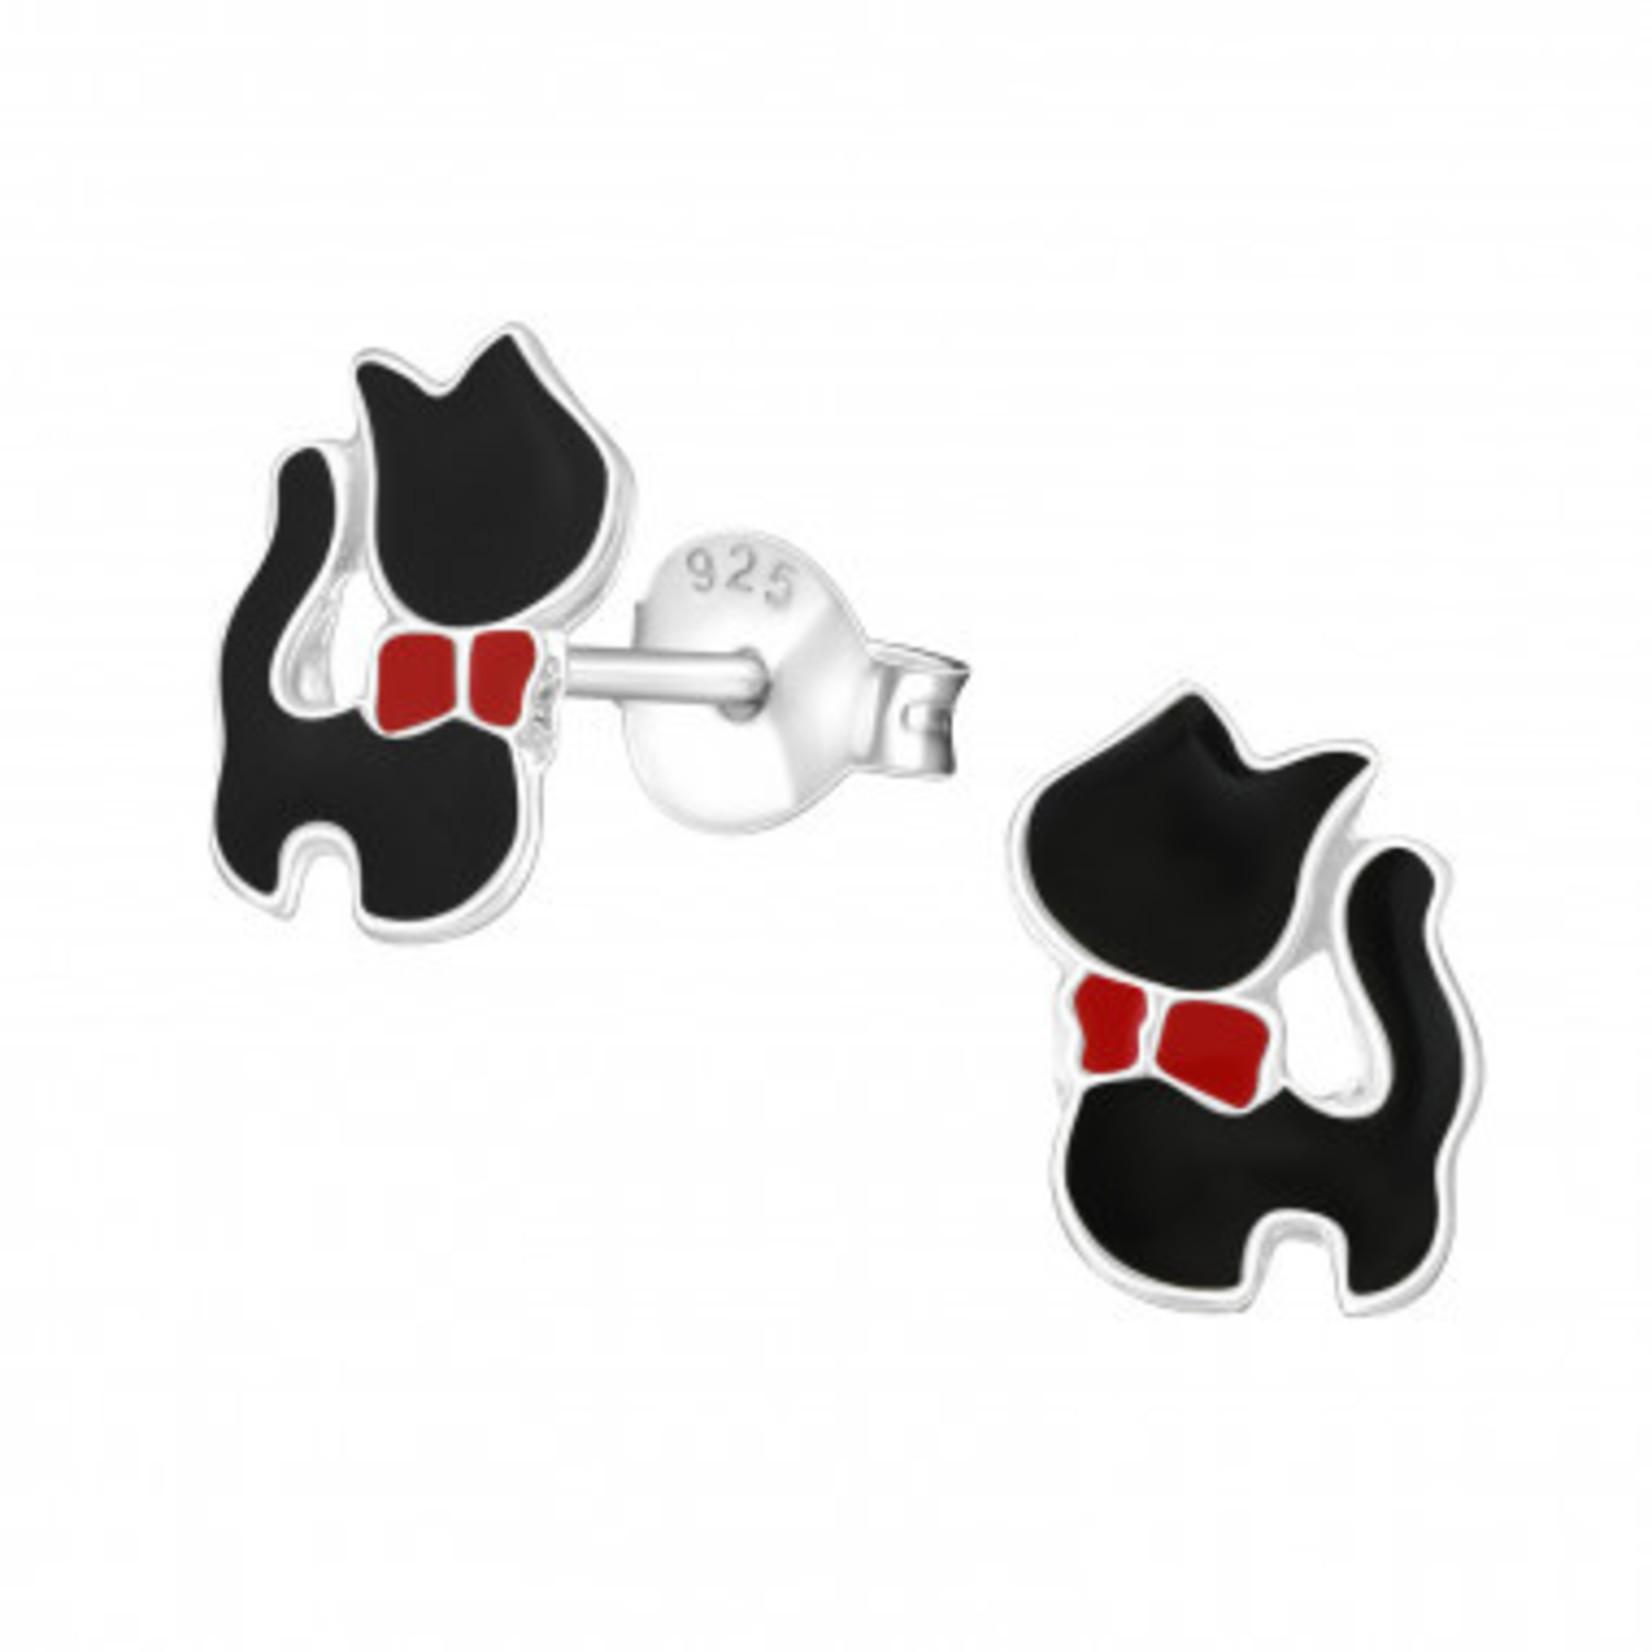 Oorstekers - Kat staand - Zwart